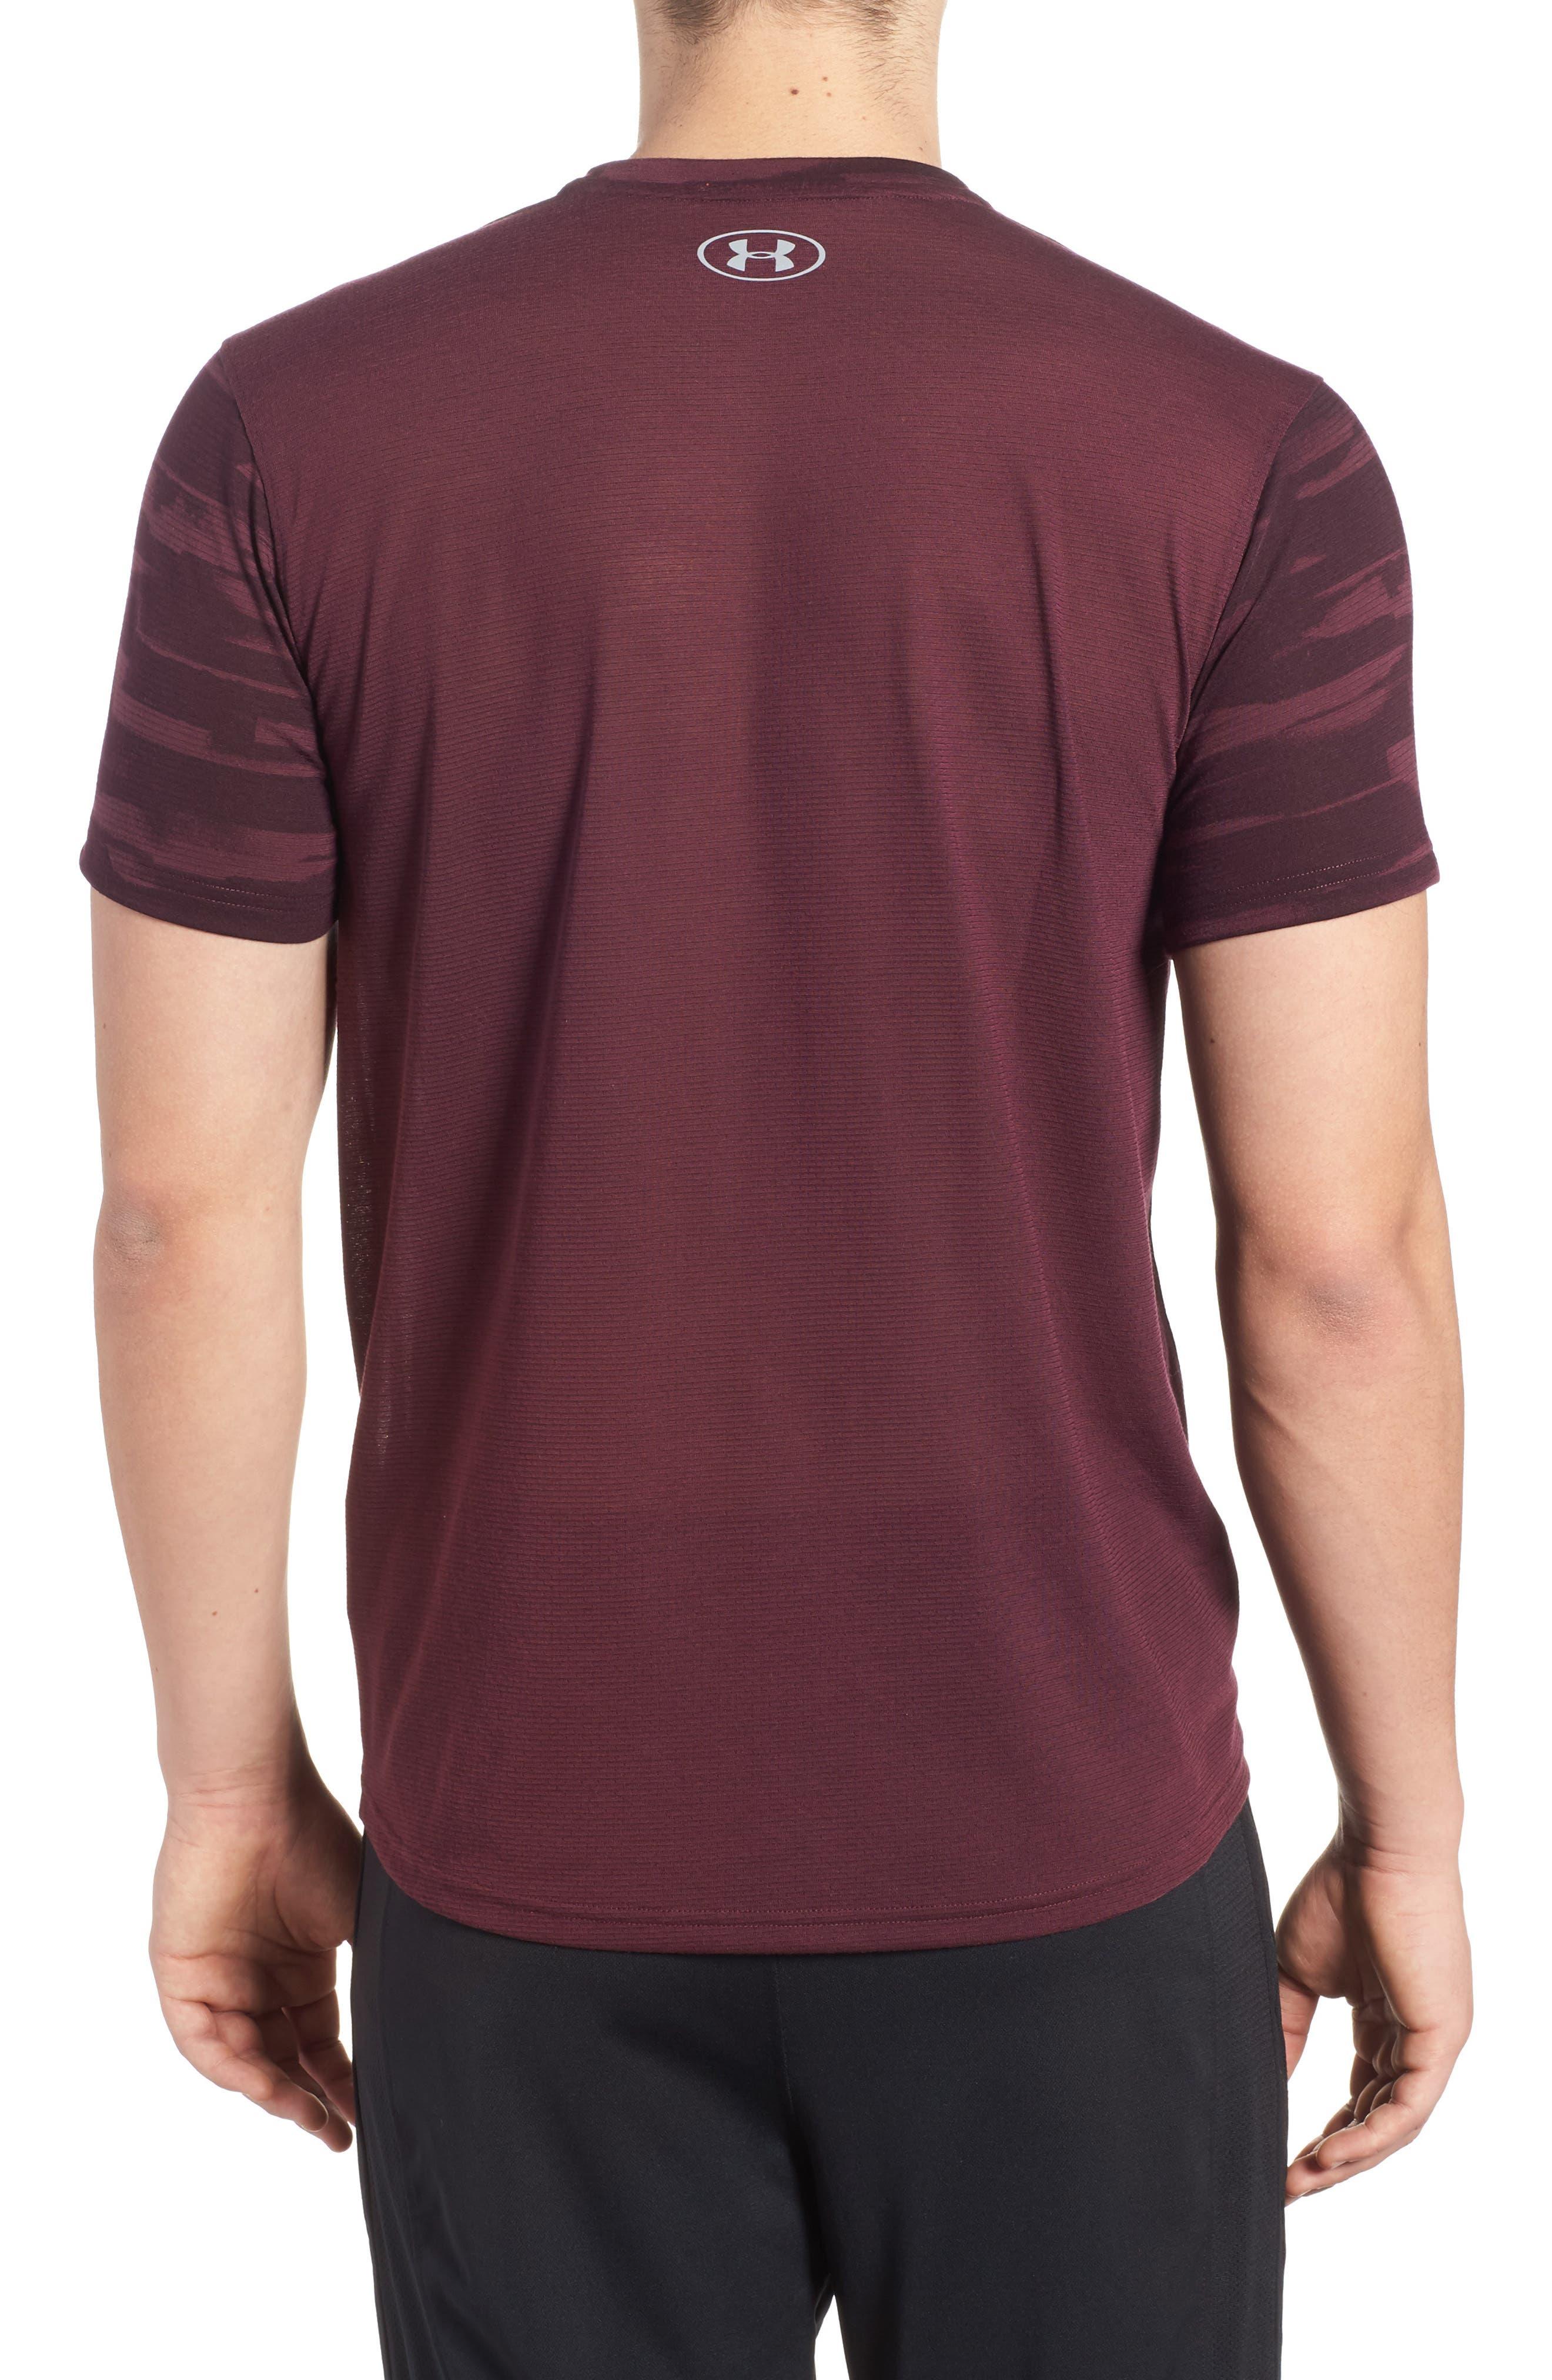 Alternate Image 2  - Under Armour Threadborne Mesh Running T-Shirt